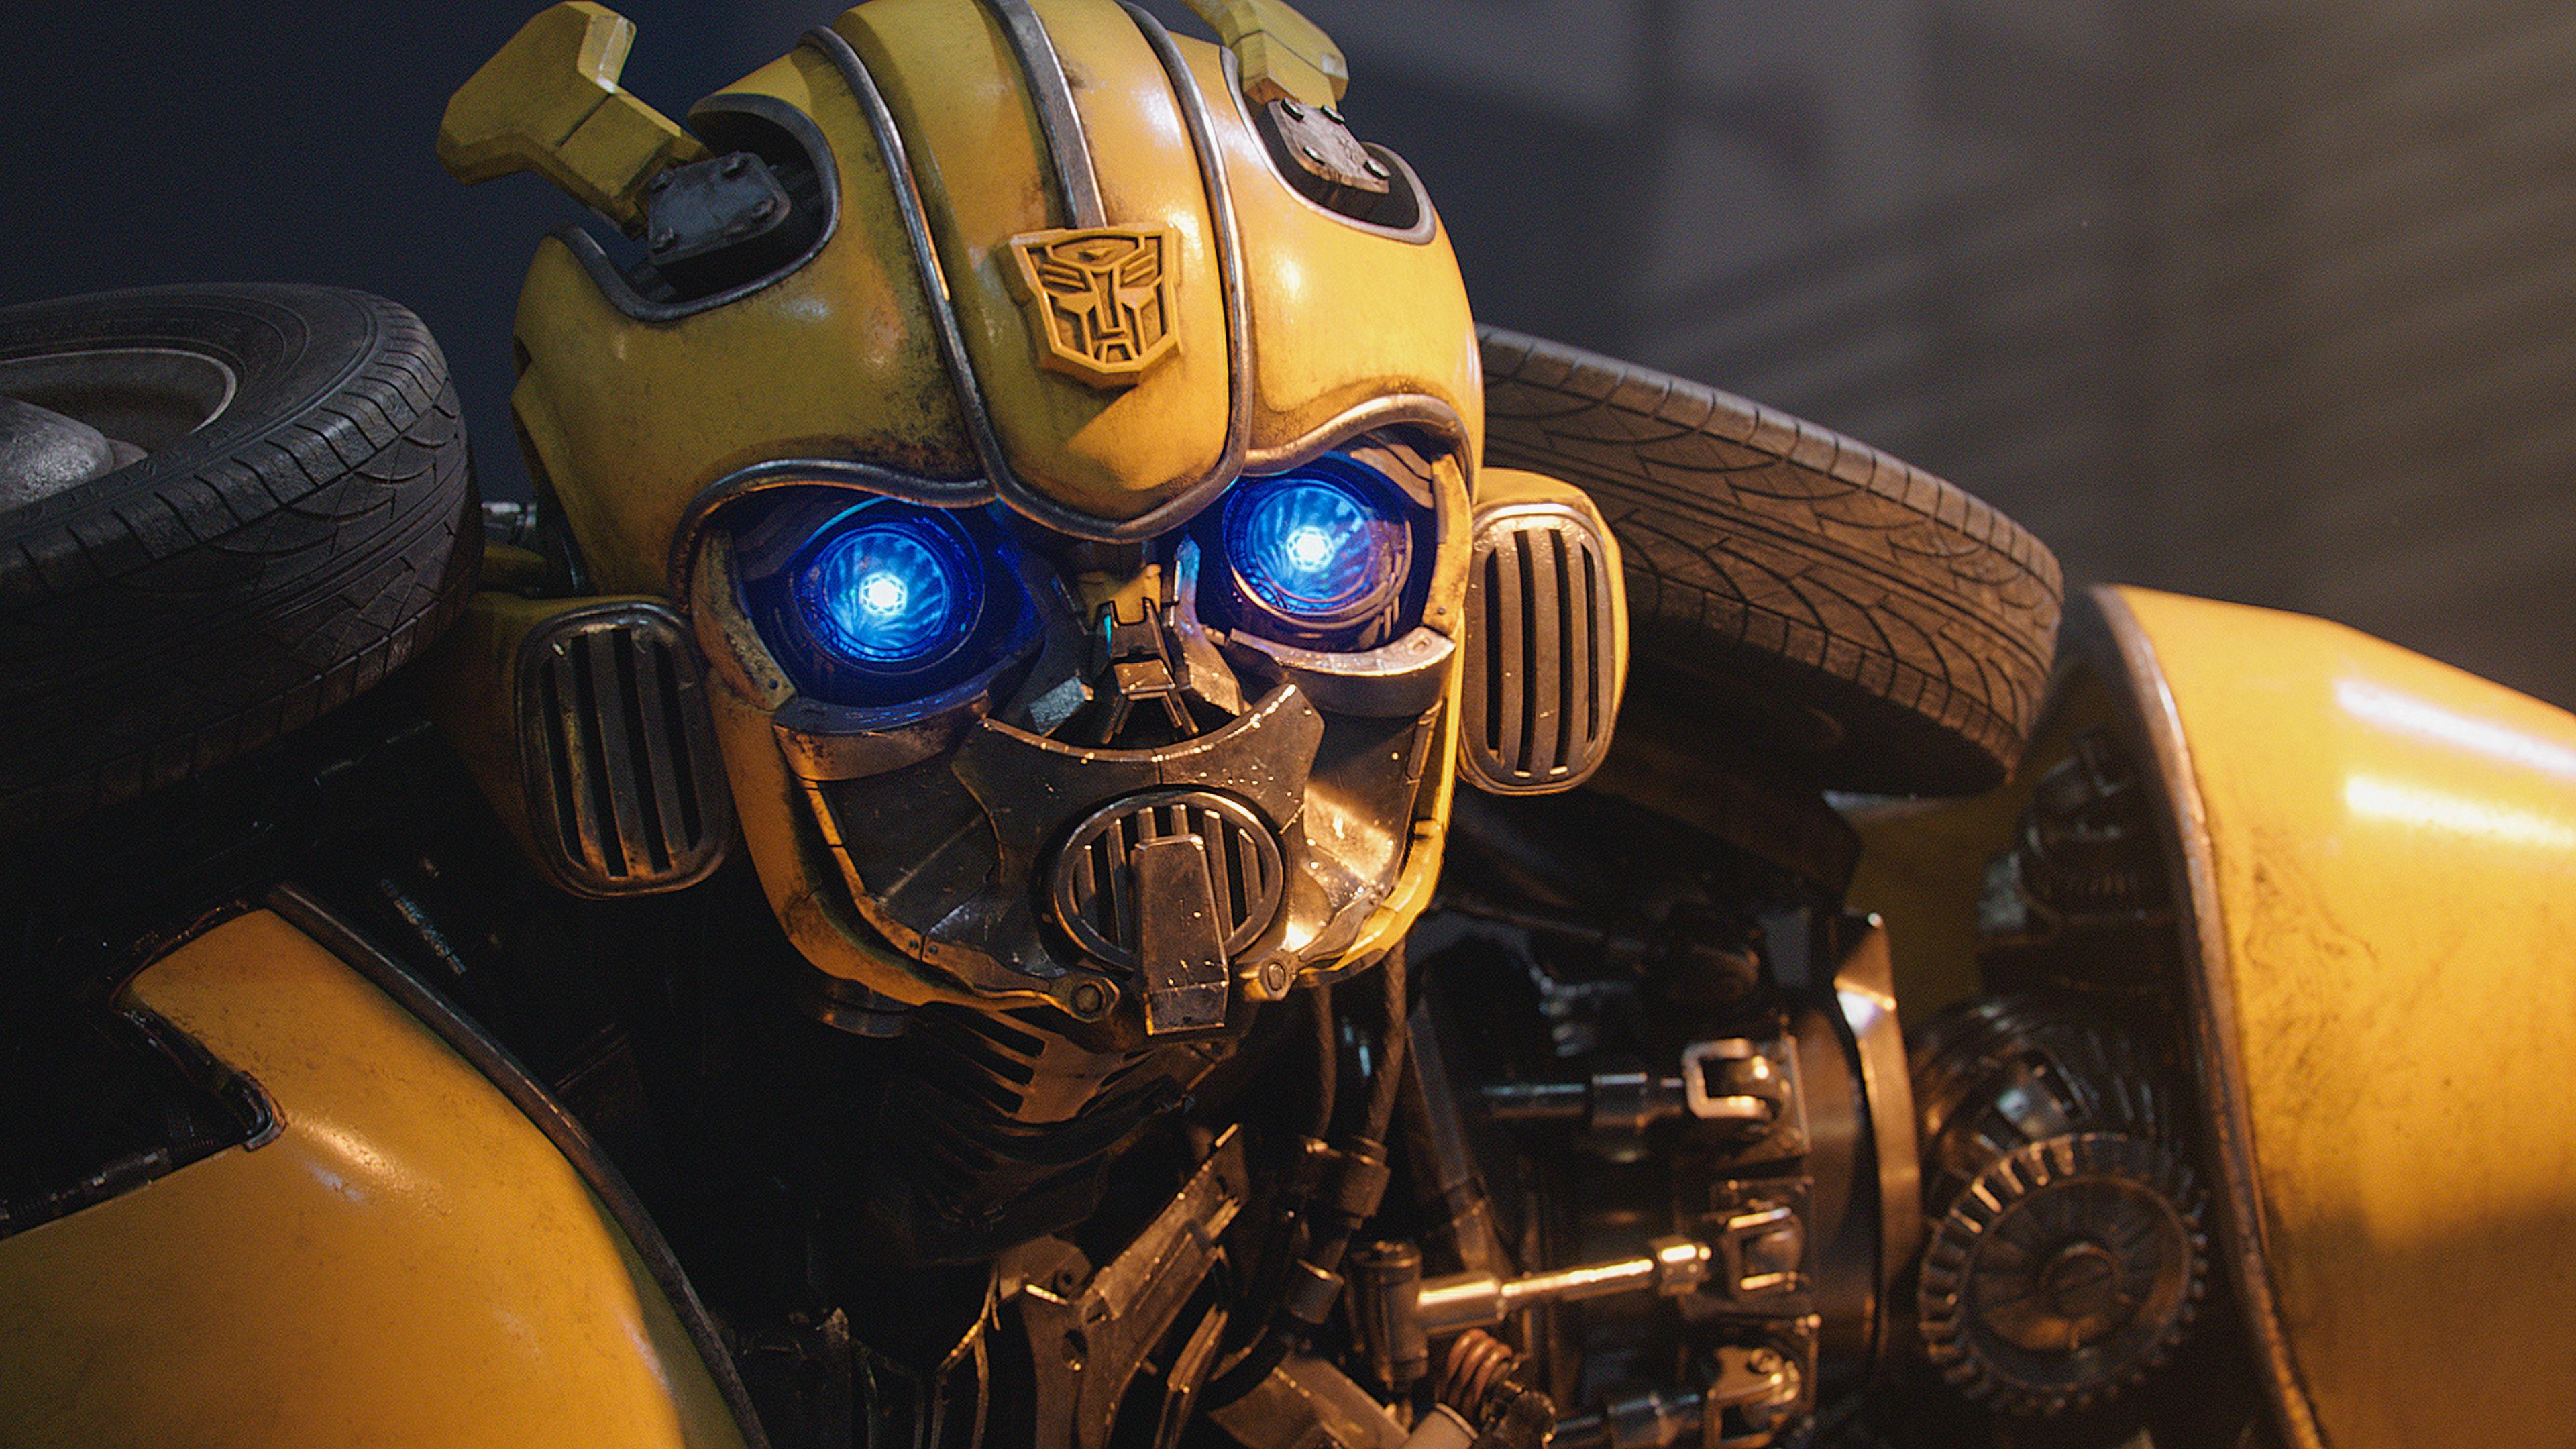 Bumblebee 2018 4k Movies Wallpapers Hd Wallpapers Bumblebee Wallpapers 4k Wallpapers 2018 Movies Wallpapers Transformers Movie Bumble Bee Transformers